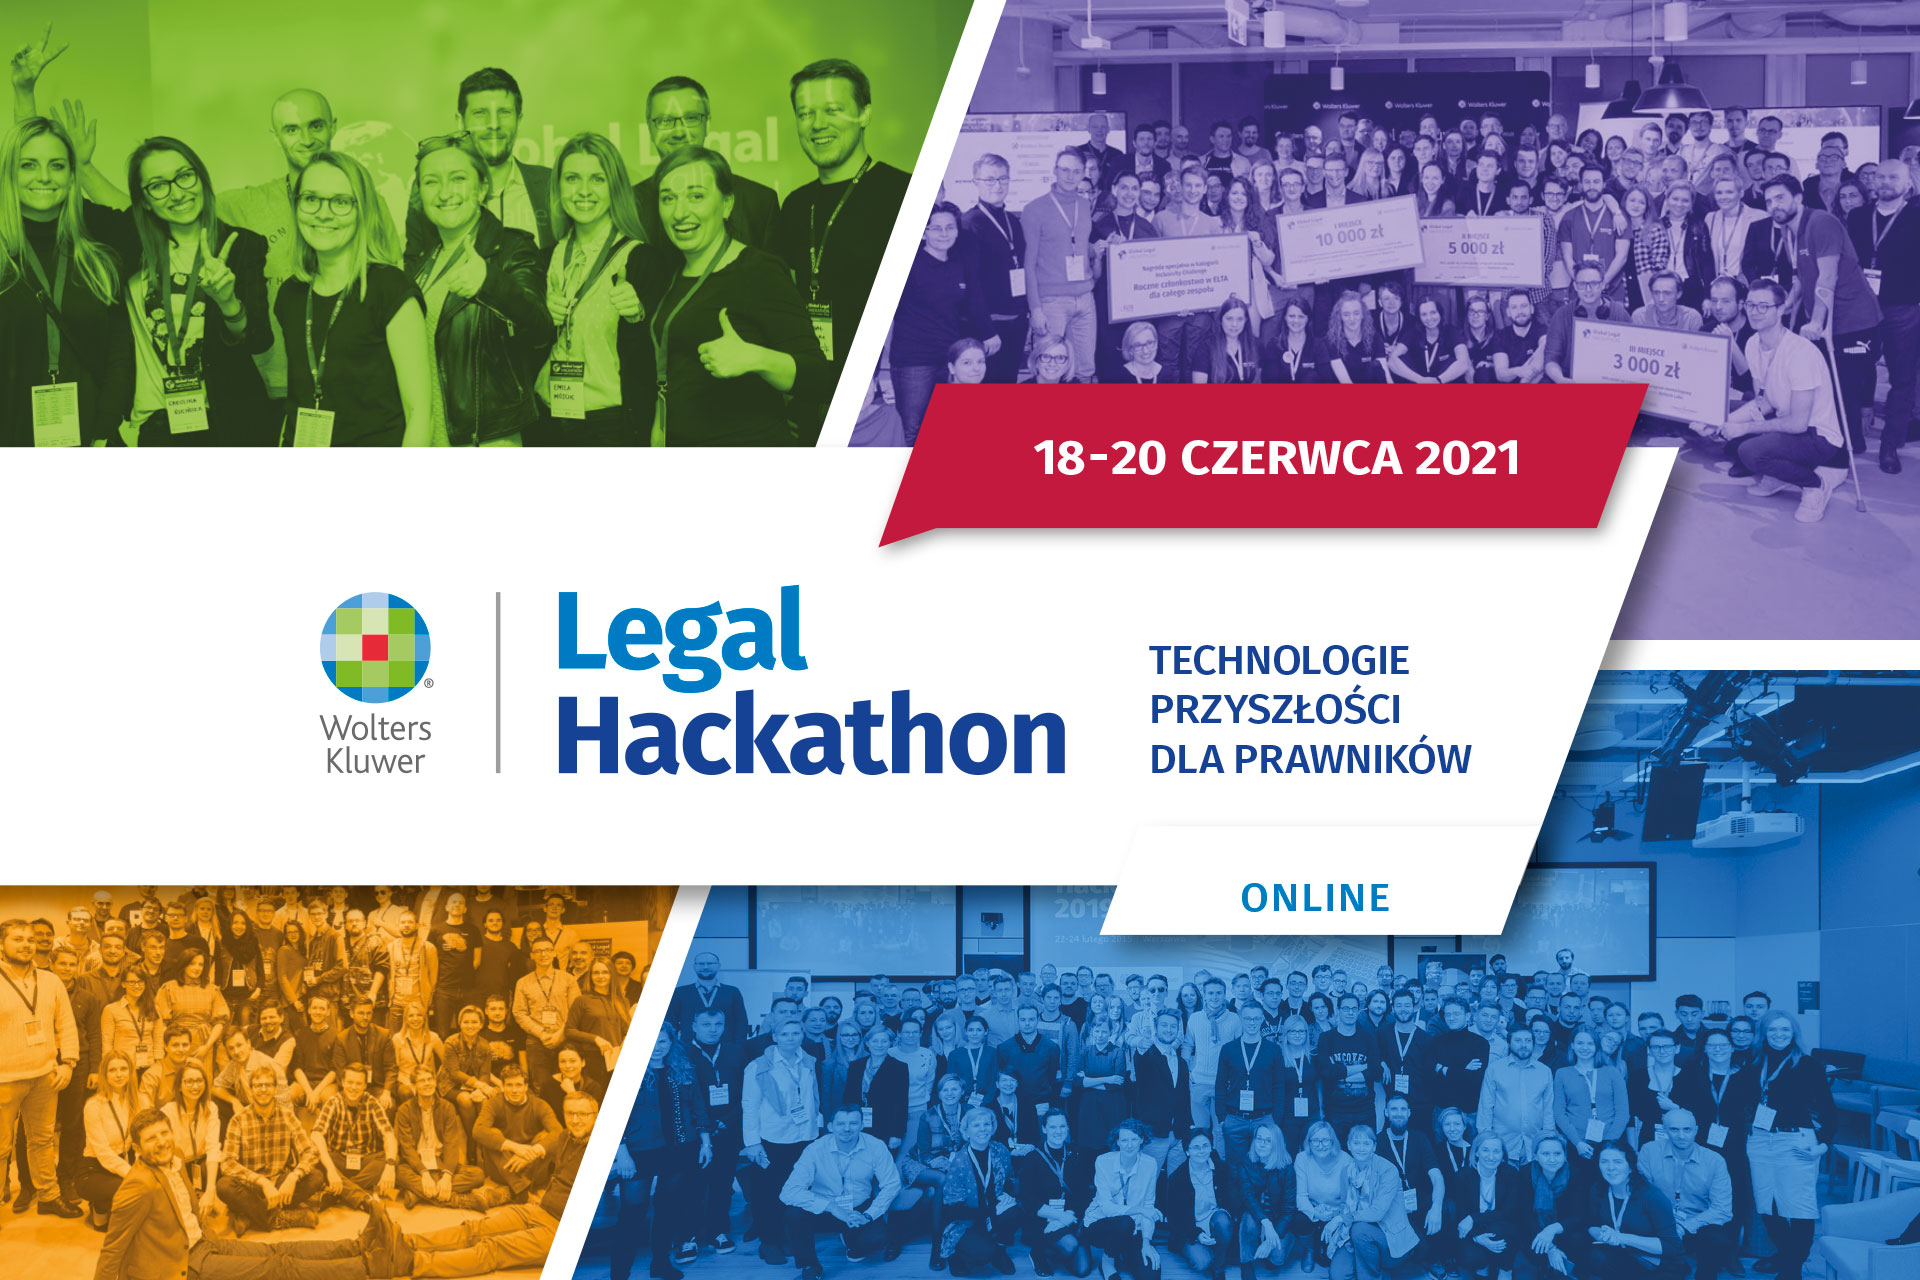 Global Legal Hackathon 2021